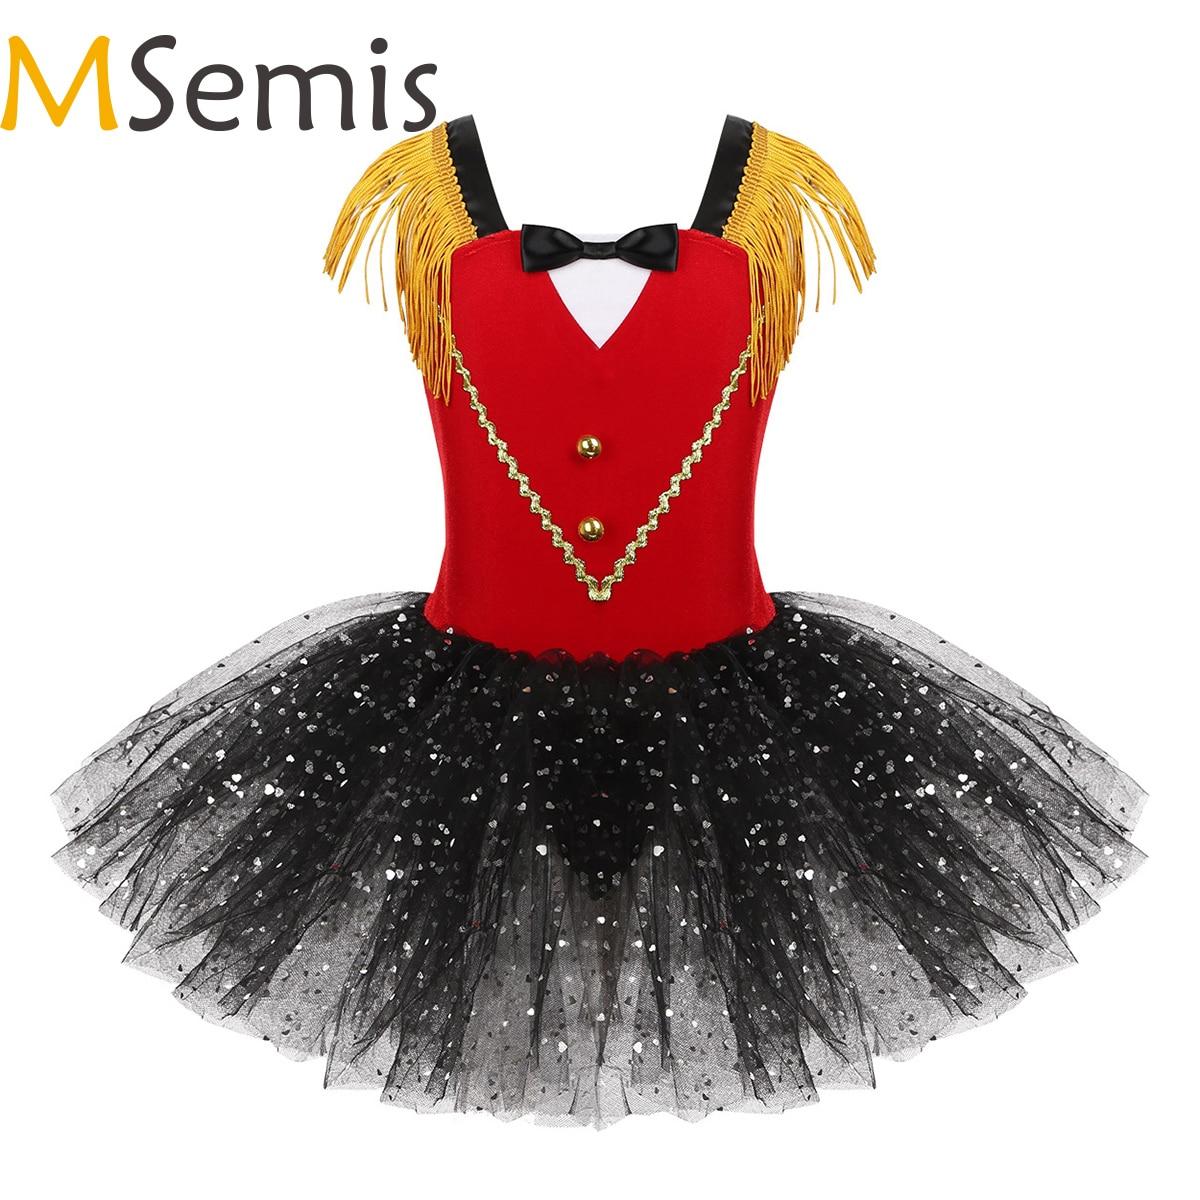 Kids Girls Halloween Circus Ringmaster Costume Dancewear Tassel Bowtie Sweetheart Sequins Tutu Gymnastics Leotard Dance Dress